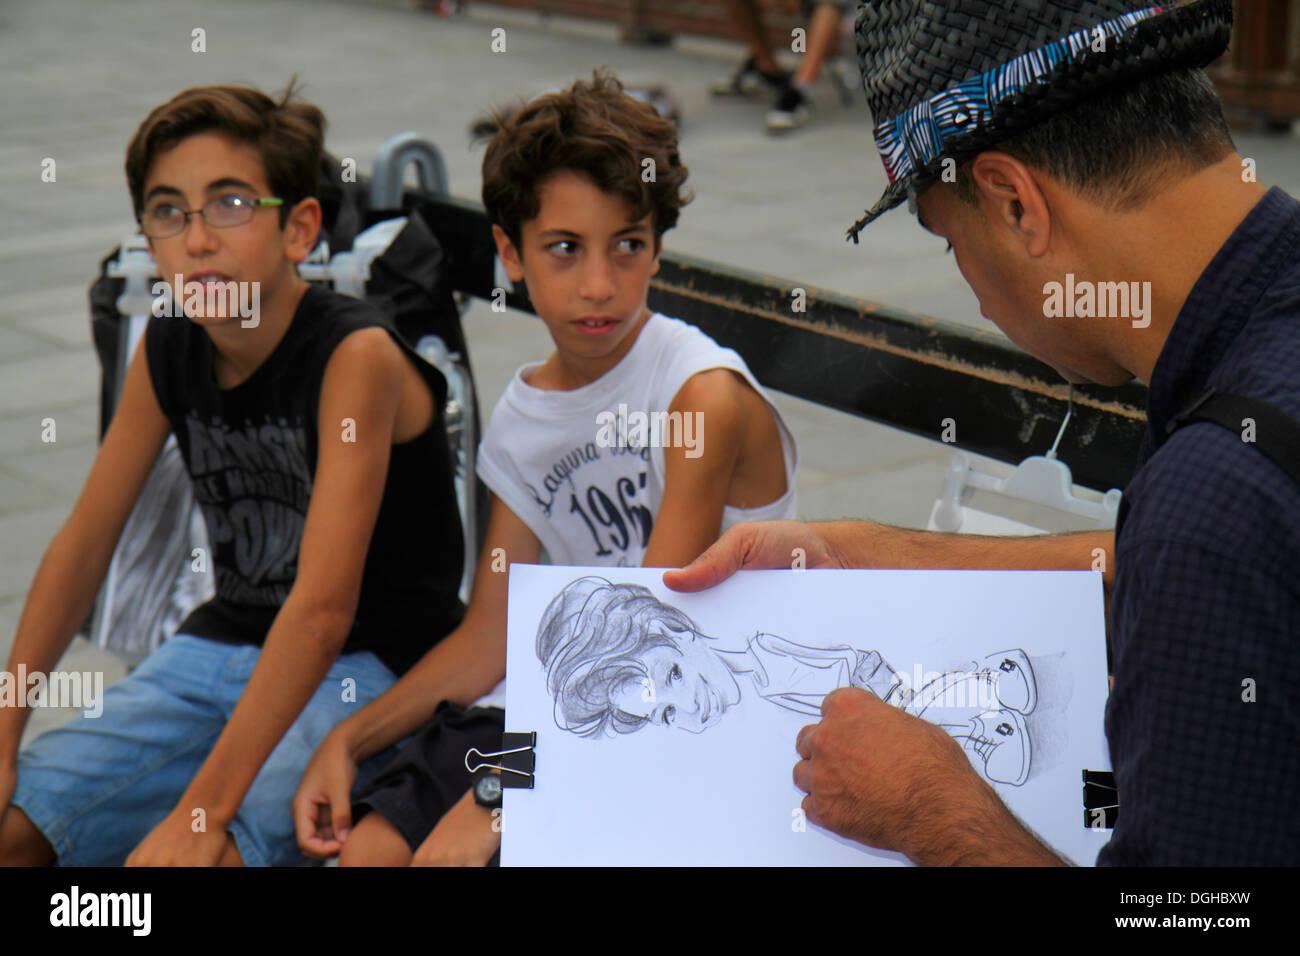 Paris France Europe French Pont au Double Bridge artist drawing caricature boy man sketching - Stock Image